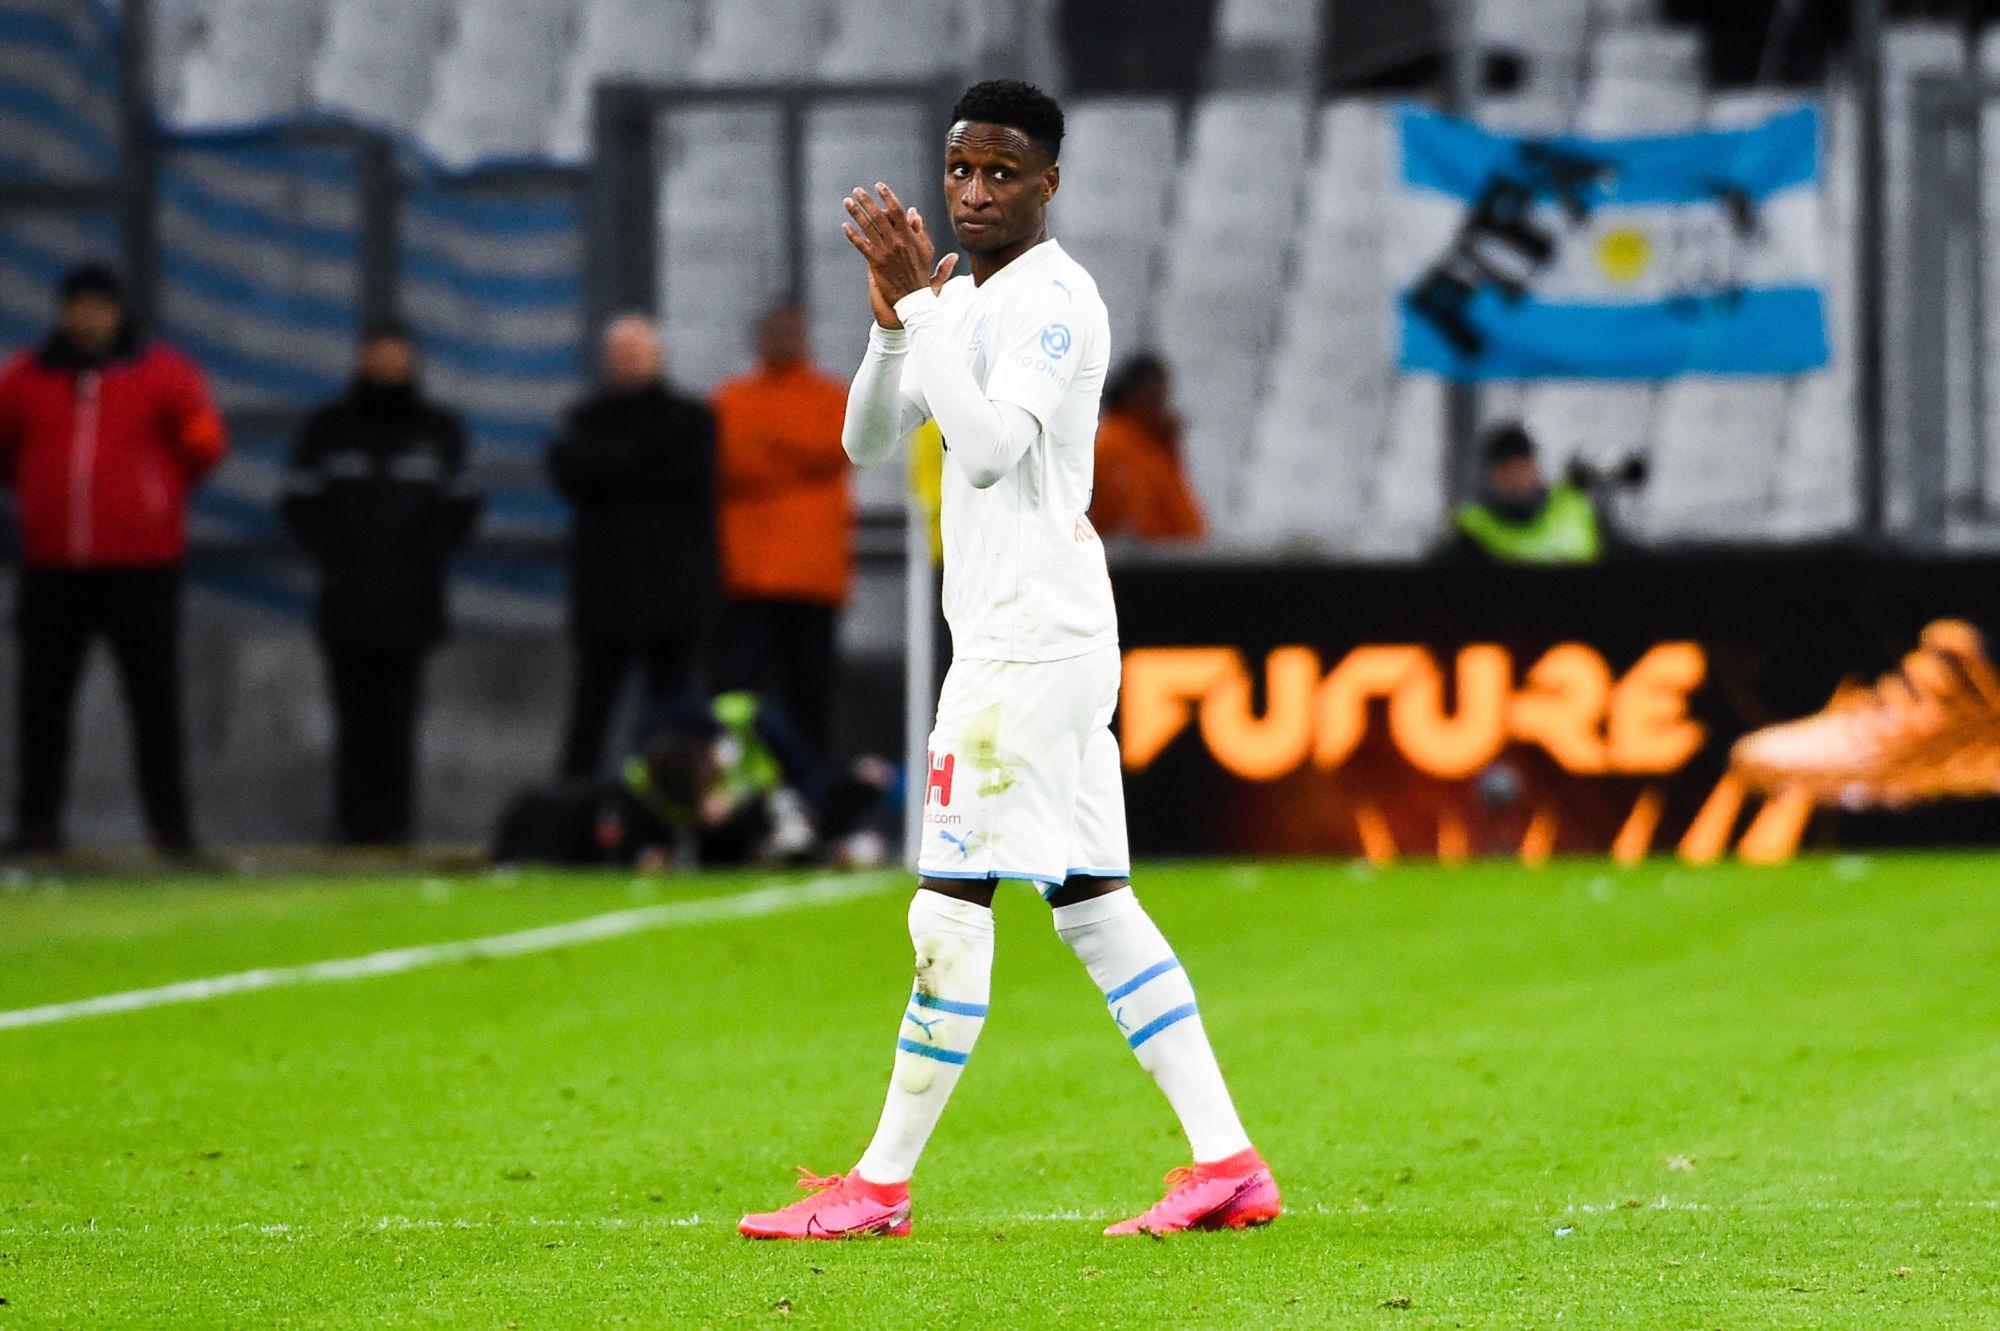 Mercato OM : Deux grands clubs européens s'intéressent à Bouna Sarr